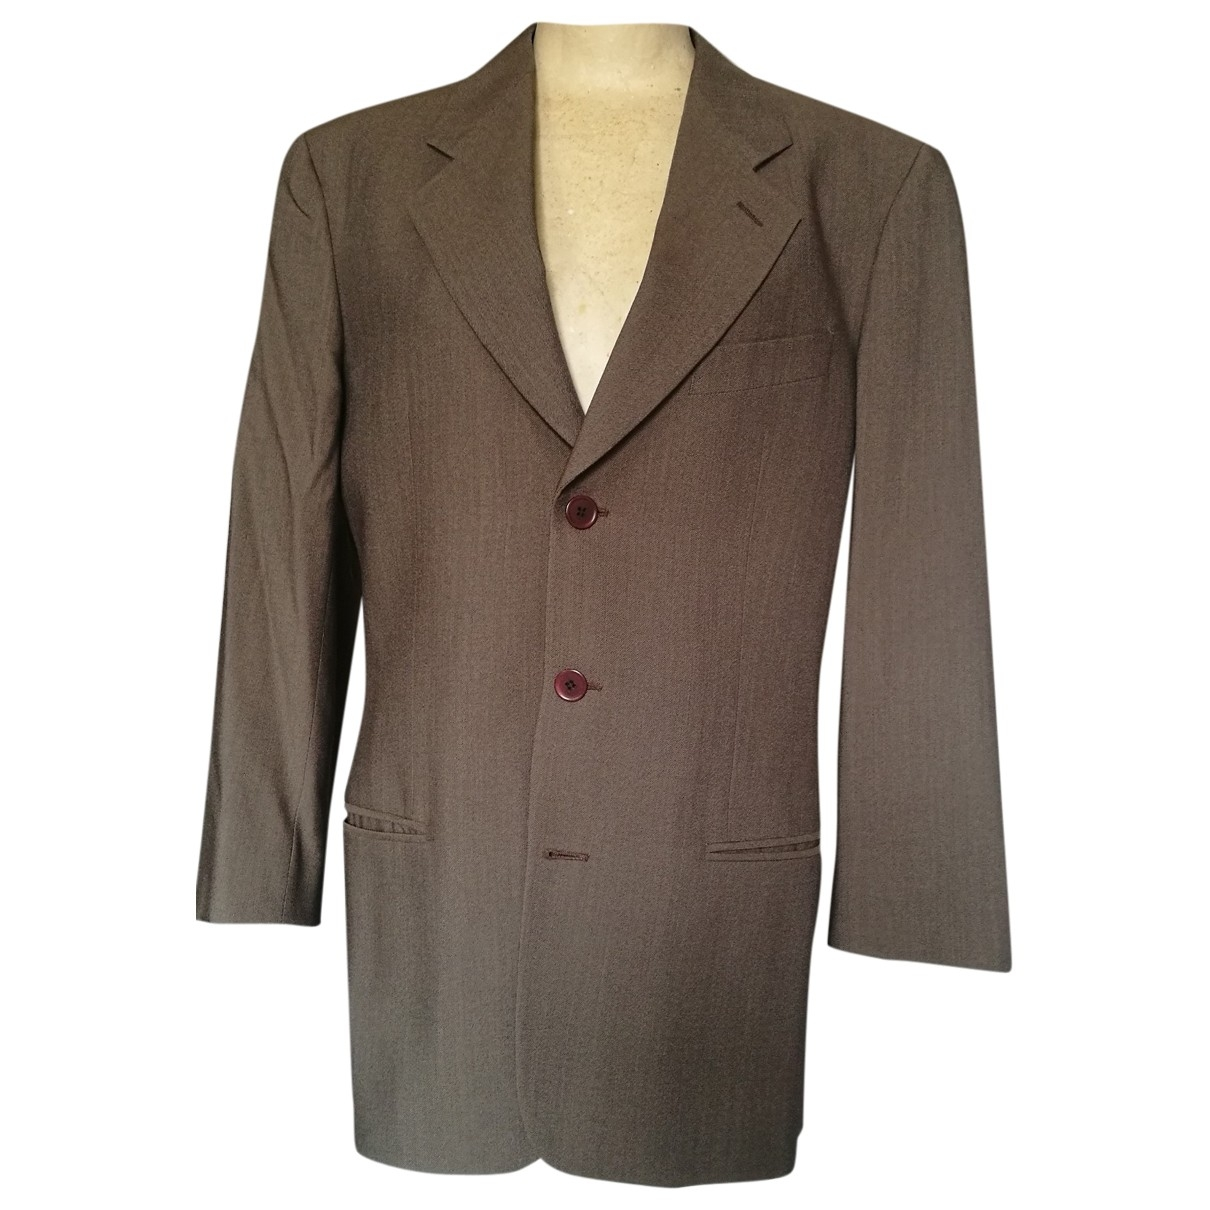 Armani Collezioni \N Wool jacket for Women 46 IT